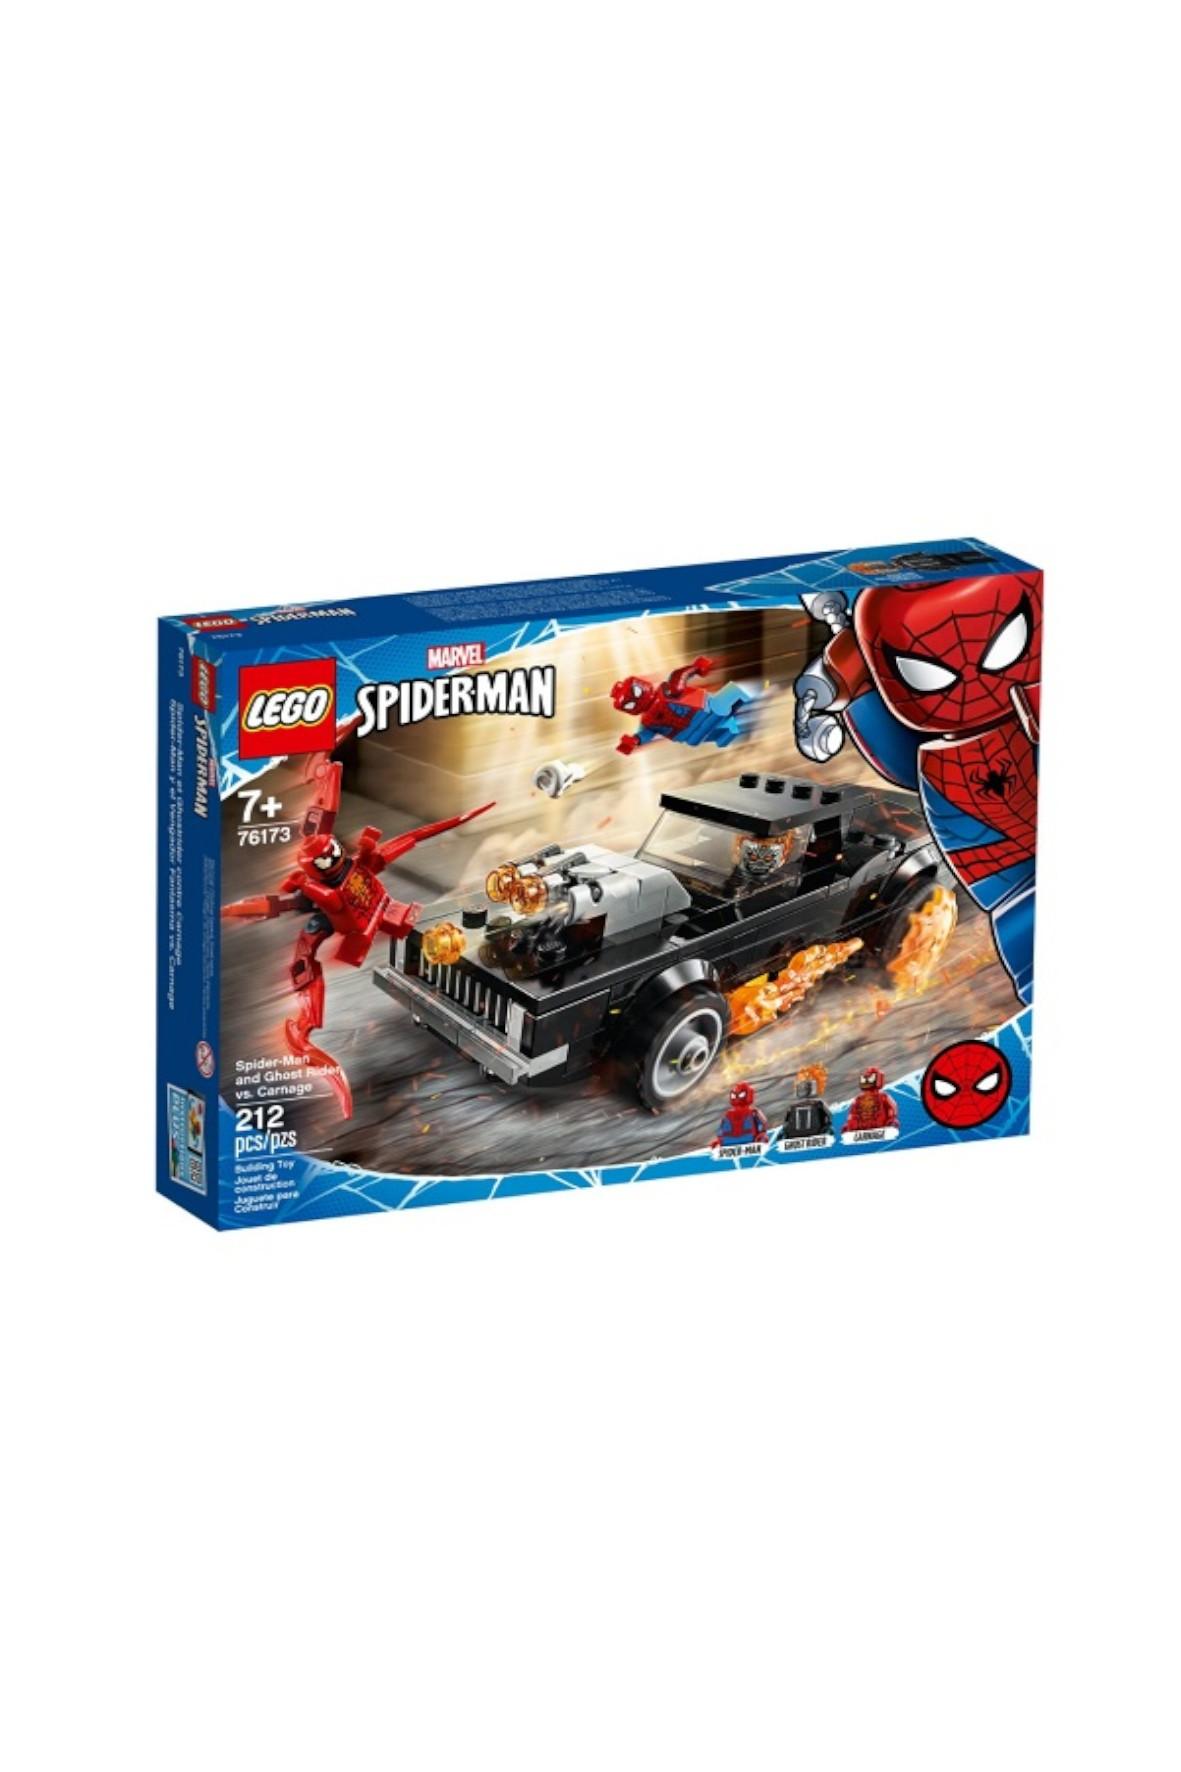 LEGO Super Heroes-Spider-Man i Upiorny Jeździec kontra Carnage-212 el